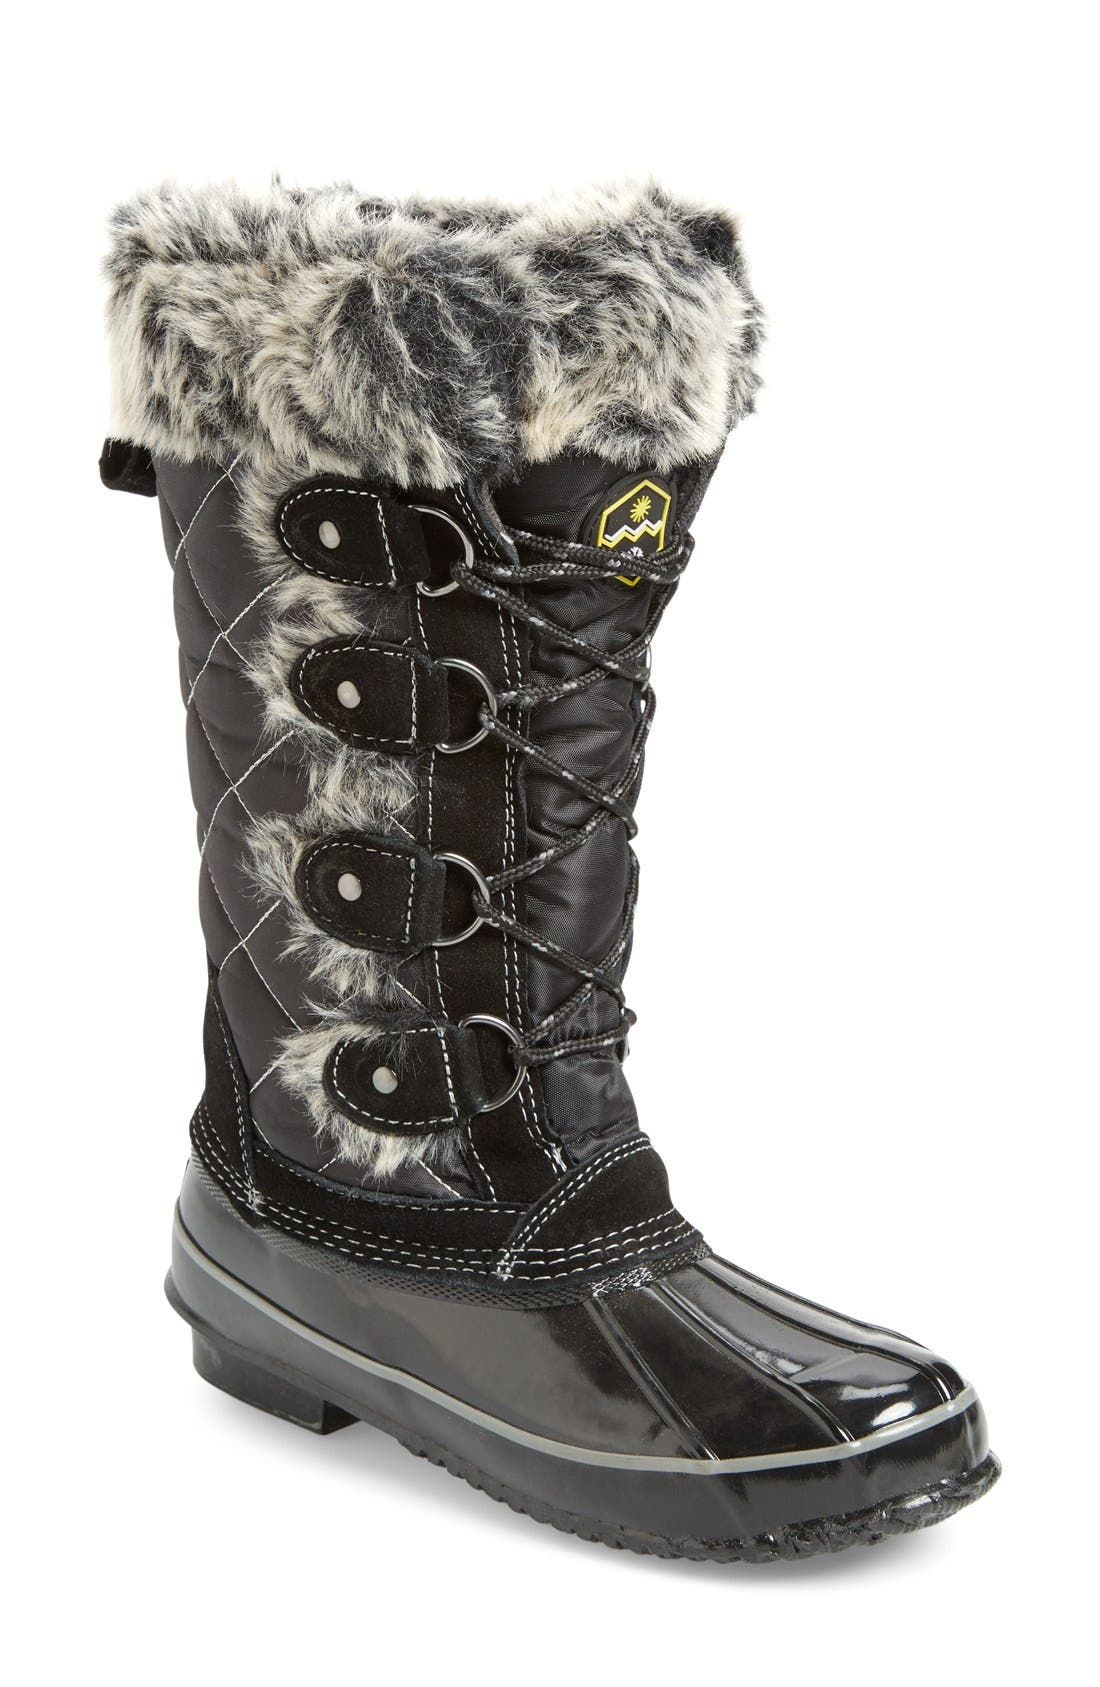 Waterproof Lace-Up Boot,                             Main thumbnail 1, color,                             001